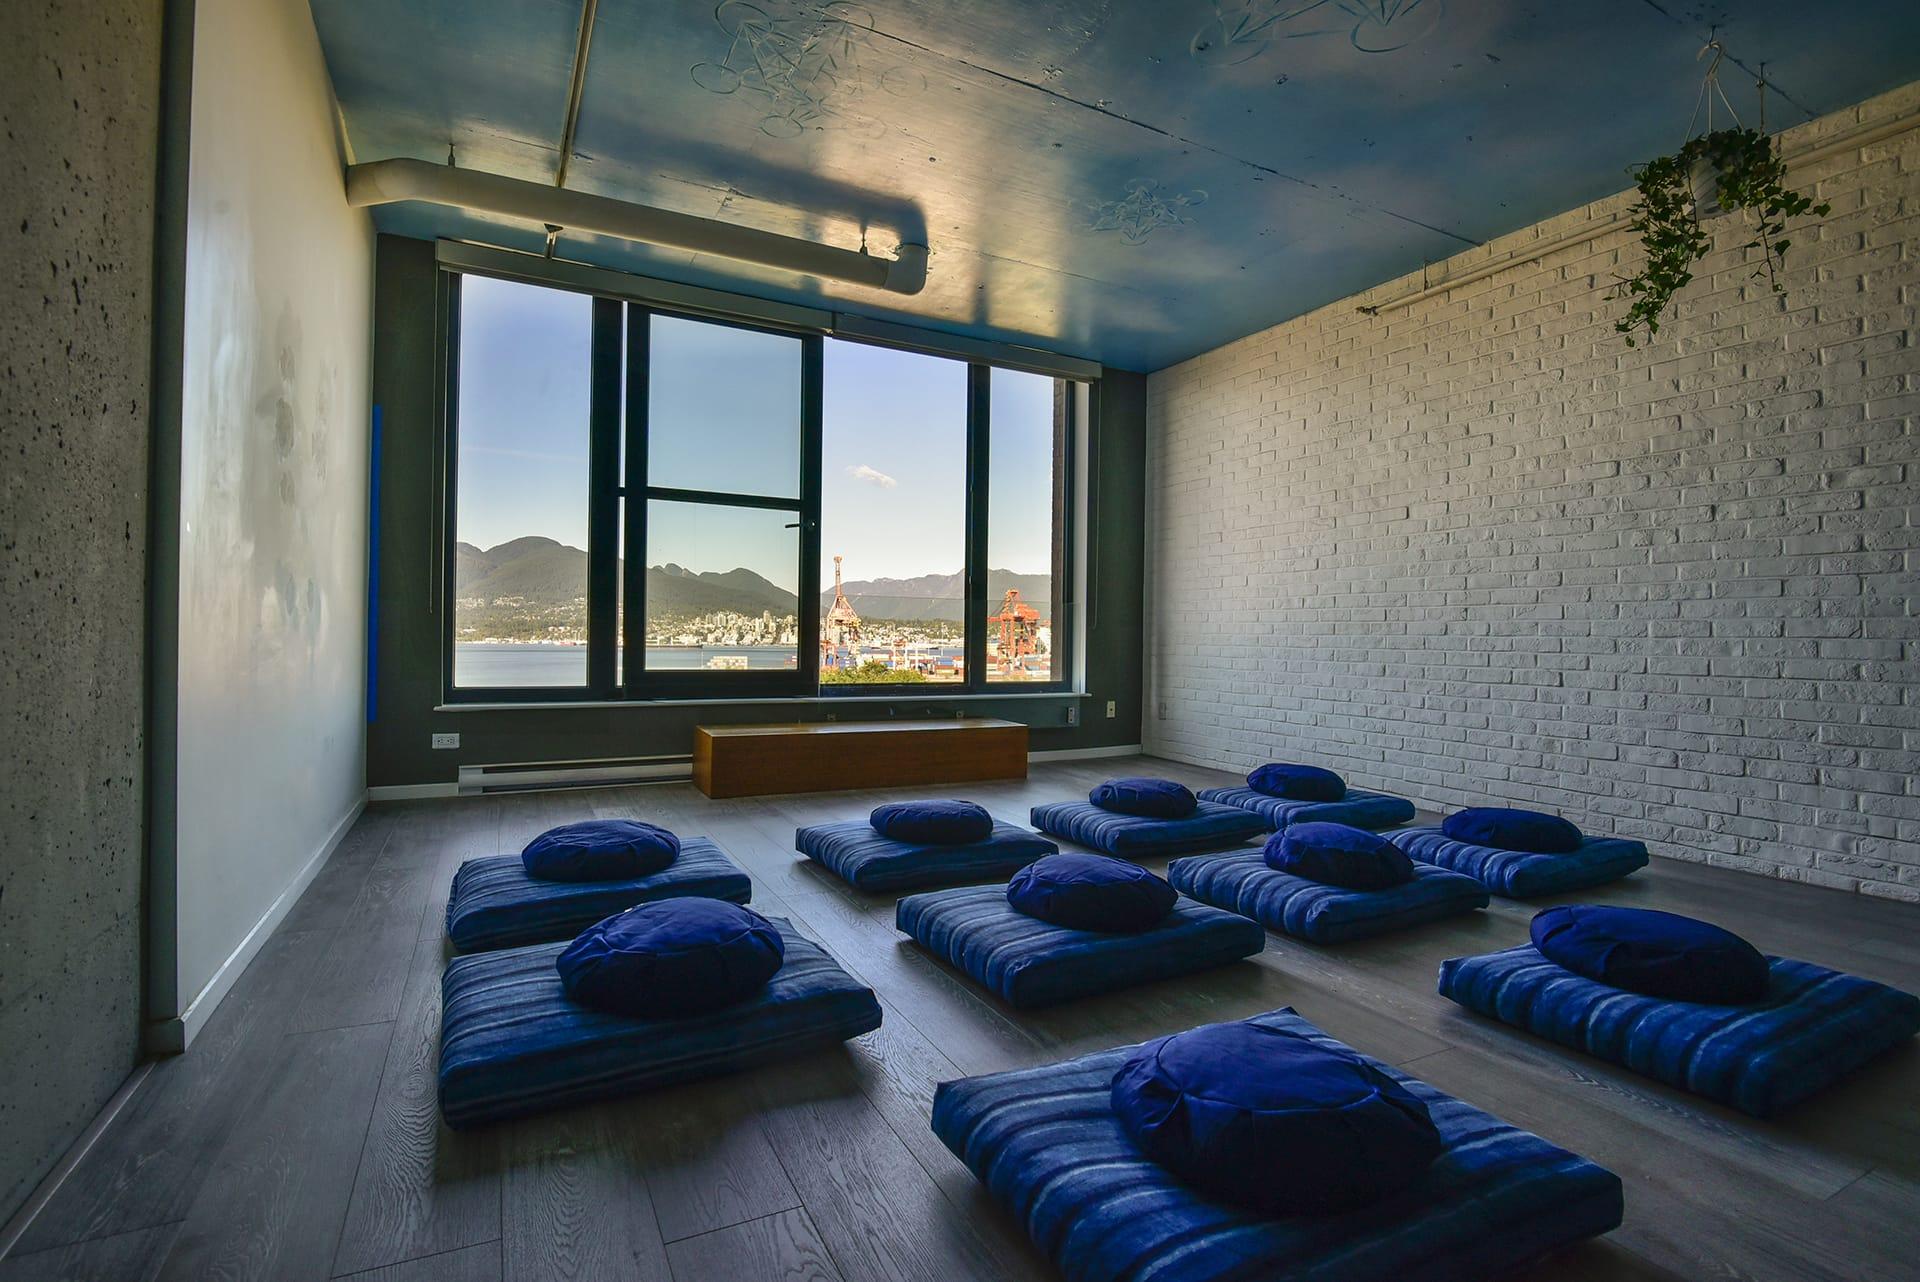 zenden meditation vancouver gastown 2